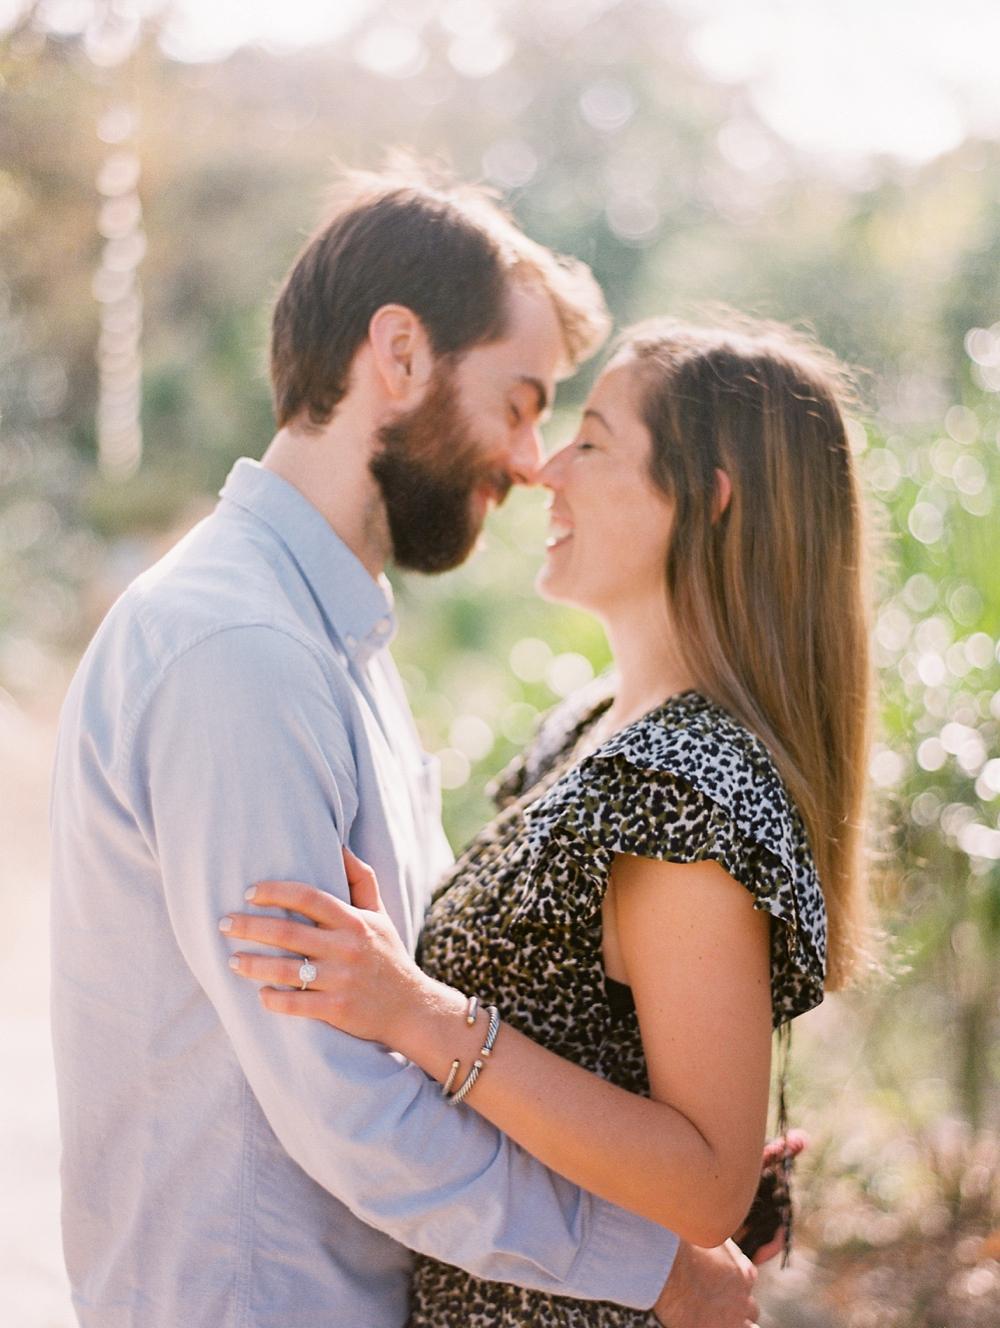 kristin-la-voie-photography-Austin-Wedding-Photographer-laguna-gloria-commodore-perry-estate-engagement-128